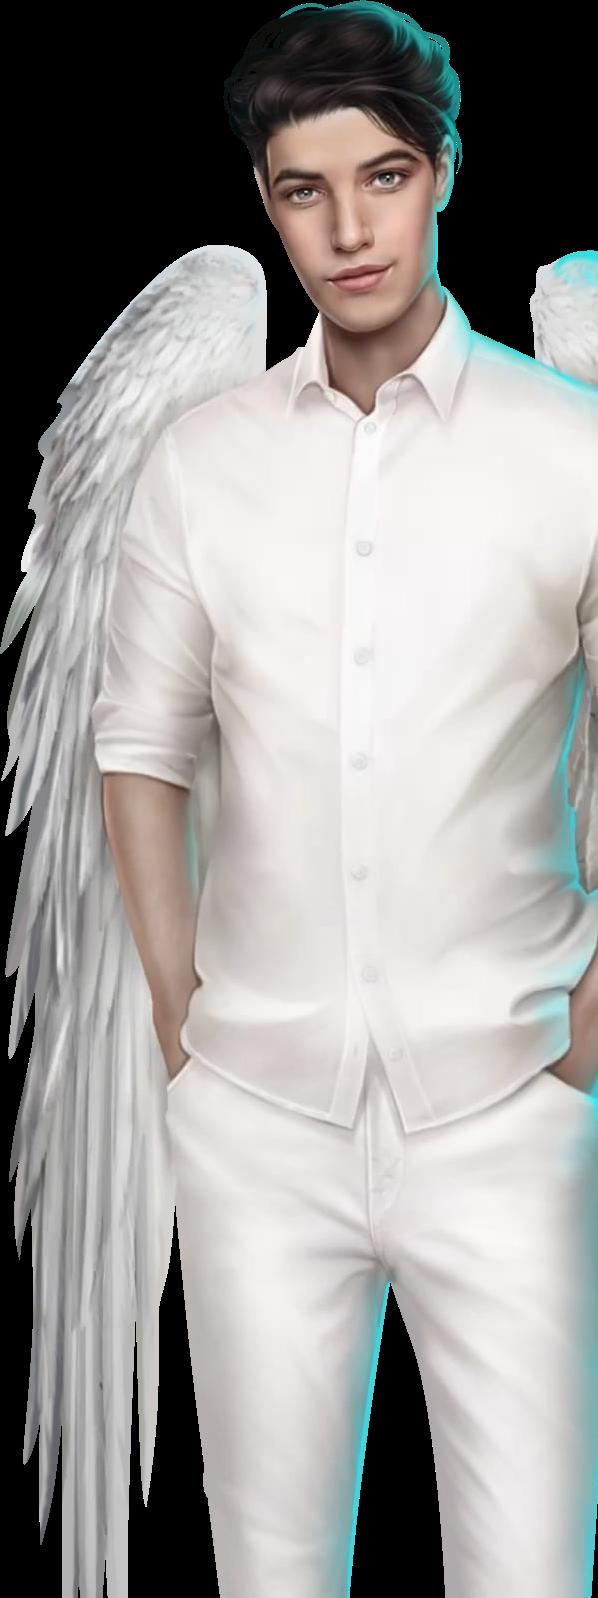 #freetoedit#клубромантики#секретнебес#сэми#ангел